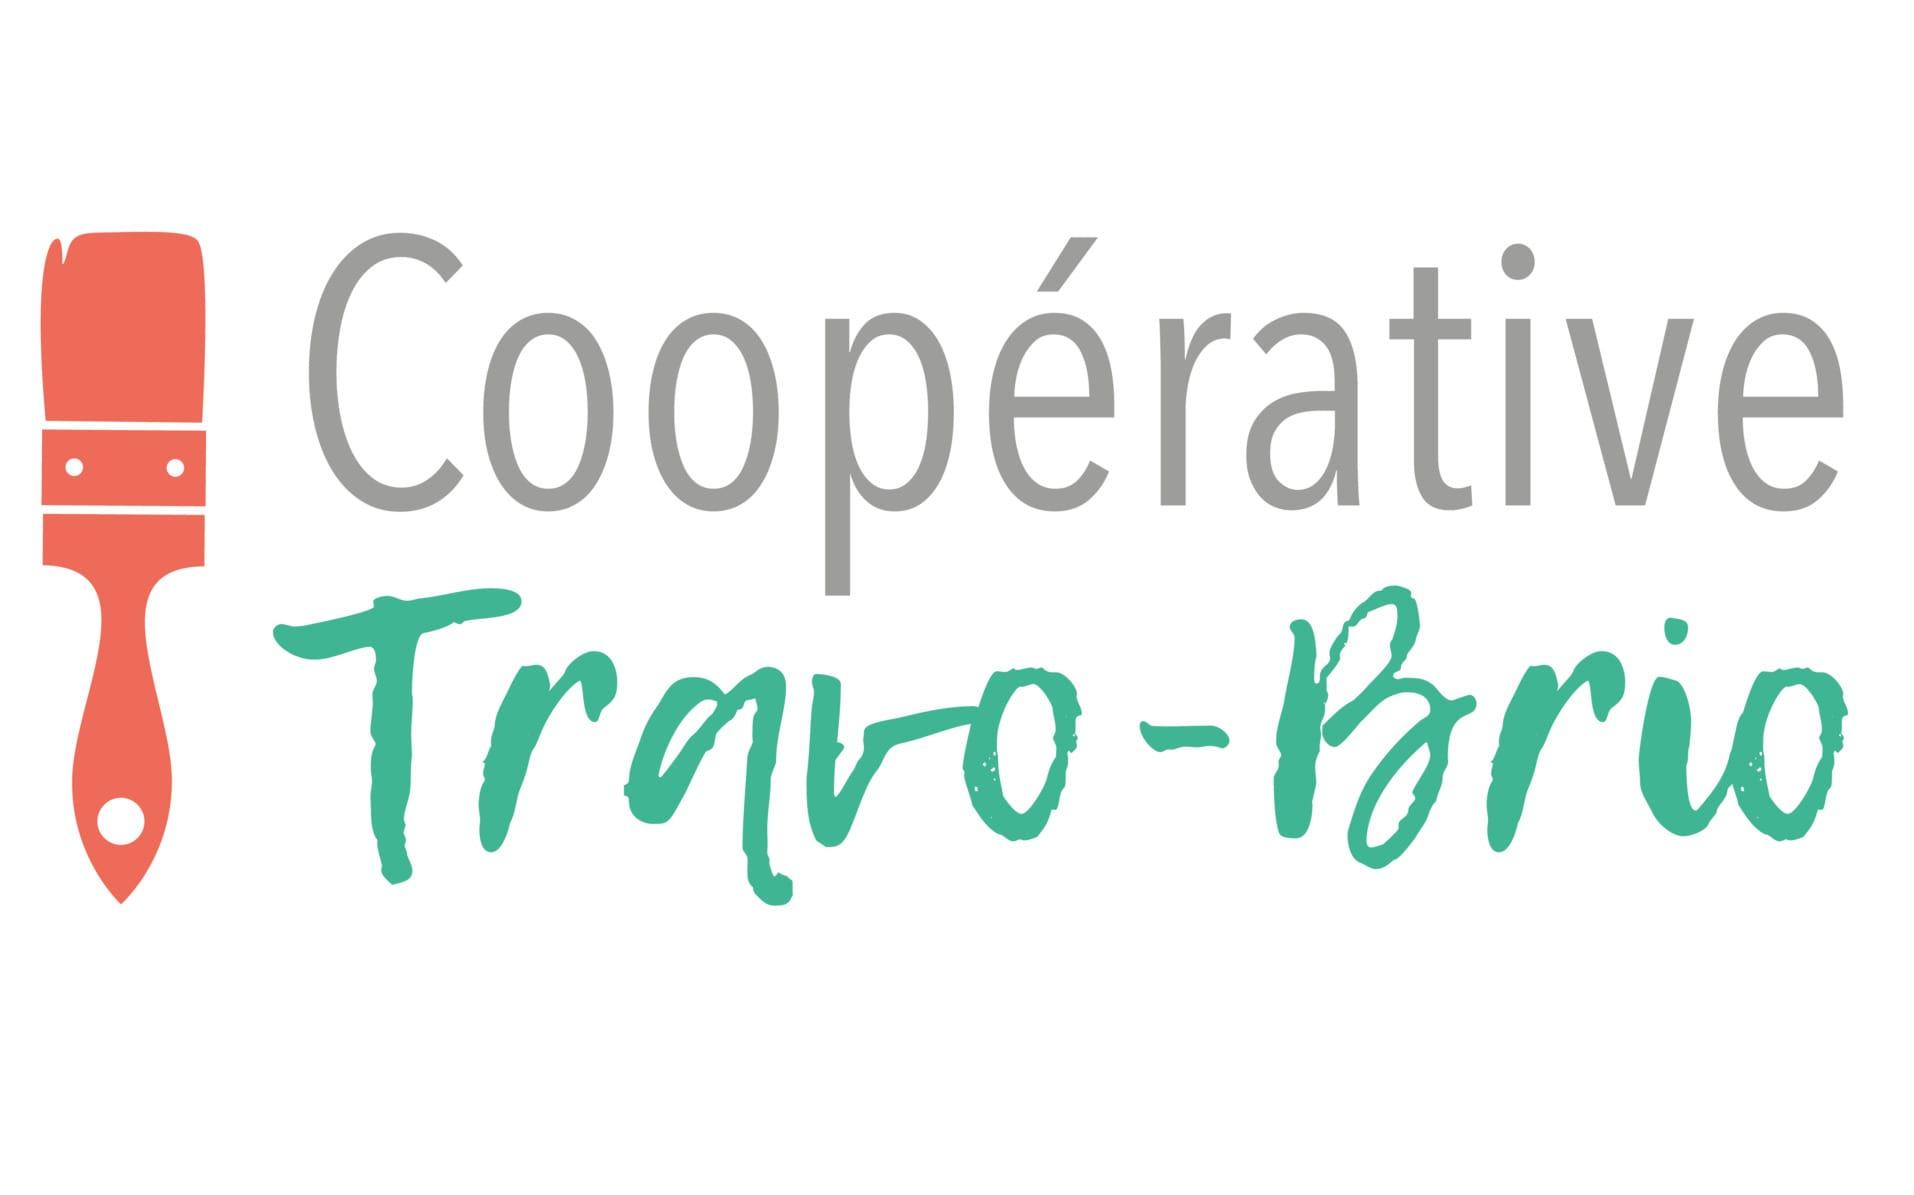 Zone CIEC: le bulletin d'information des entrepreneurs de Travo-Brio